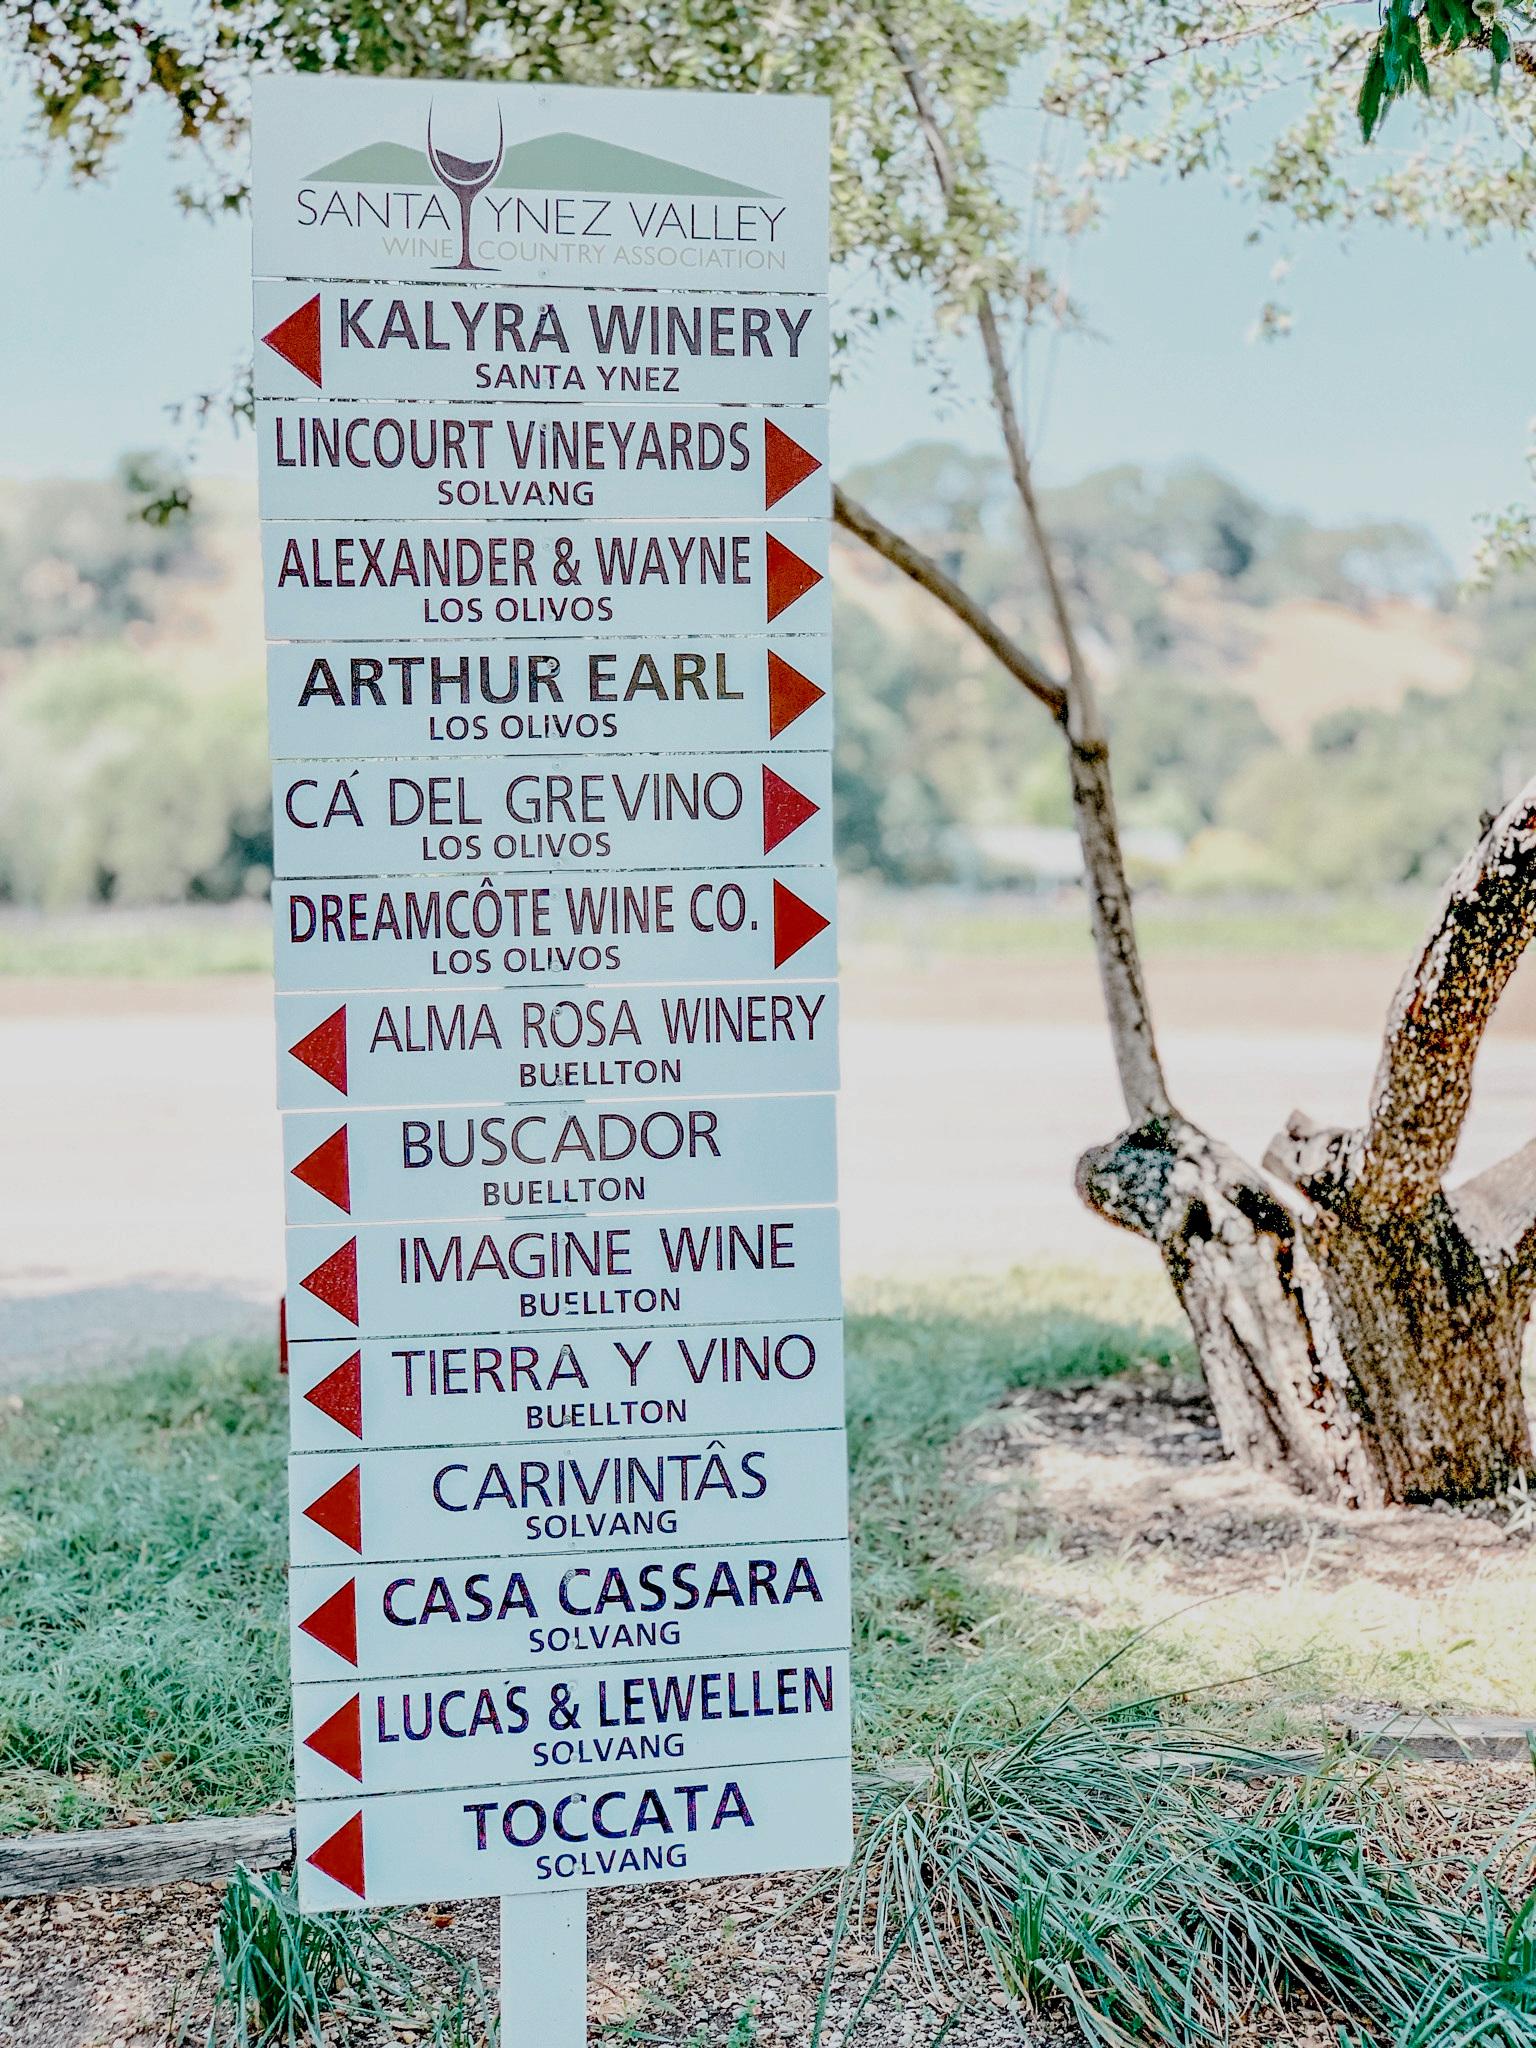 Buttonwood+Farm+Winery+%26+Vineyards+%7C+Santa+Barbara+Wine+Country+%7C+Erika+Beach